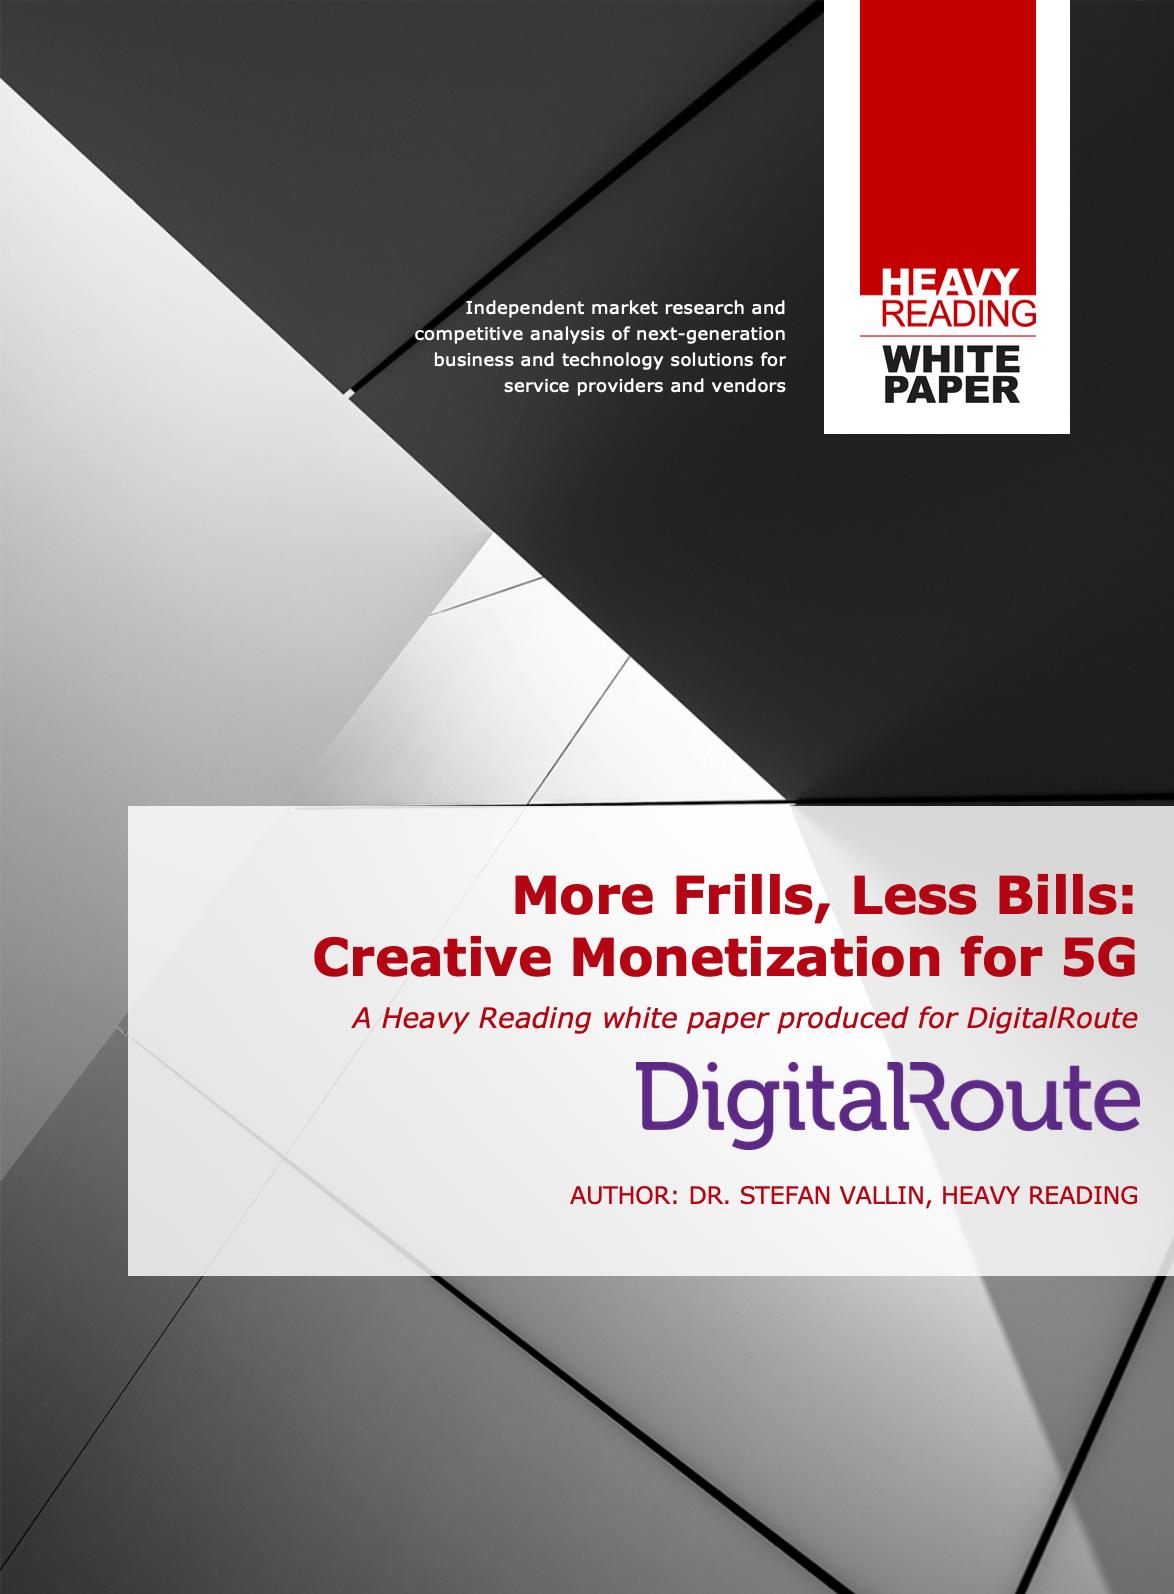 More Frills, Less Bills: Creative Monetization for 5G White Paper